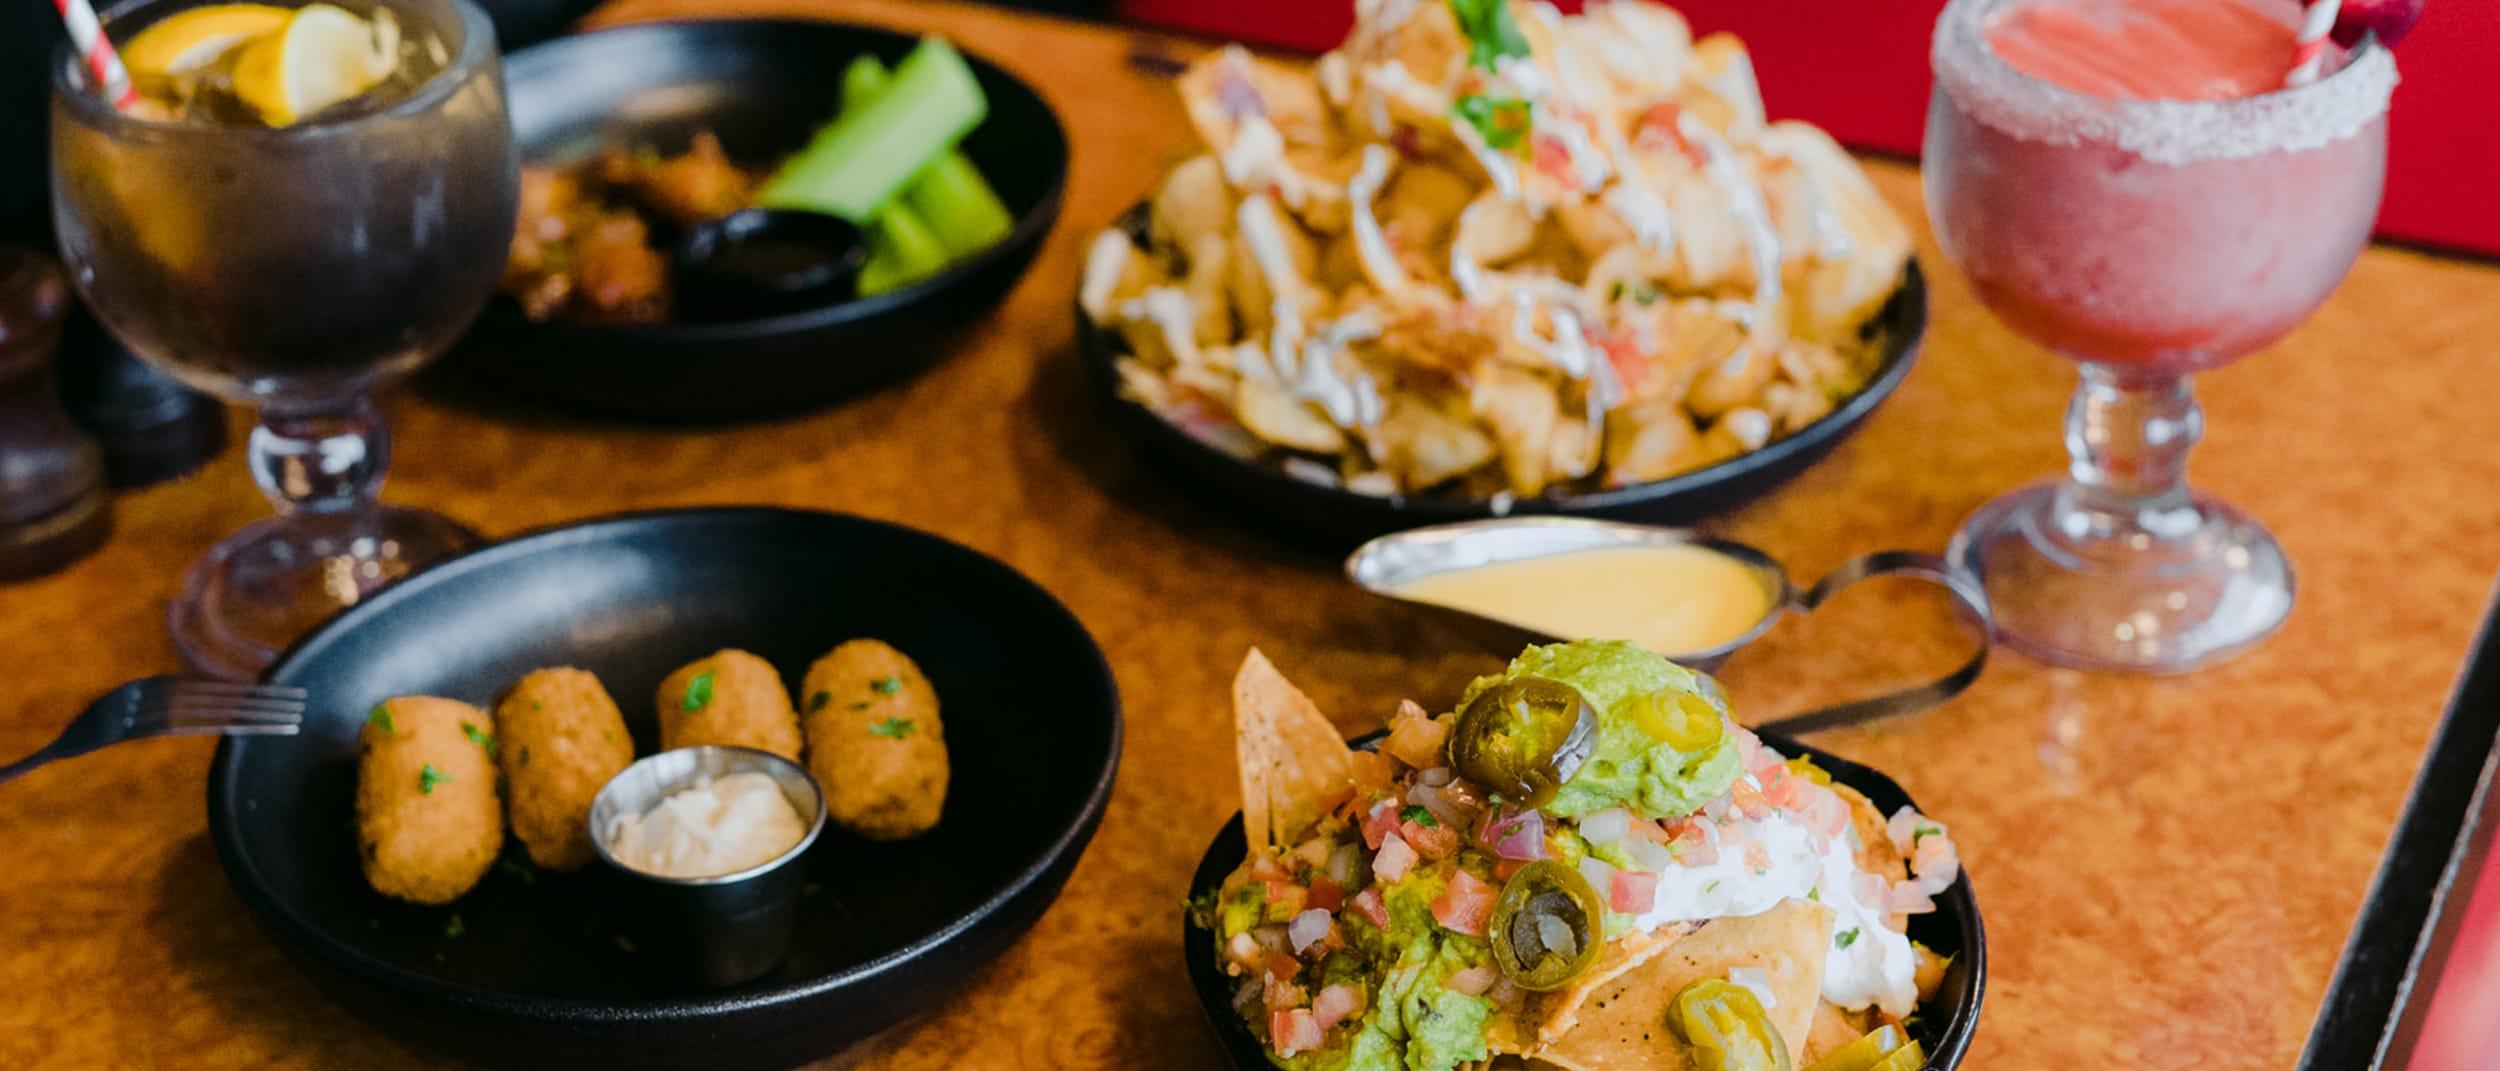 TGI FRIDAYS: Monday to Wednesday dining deals